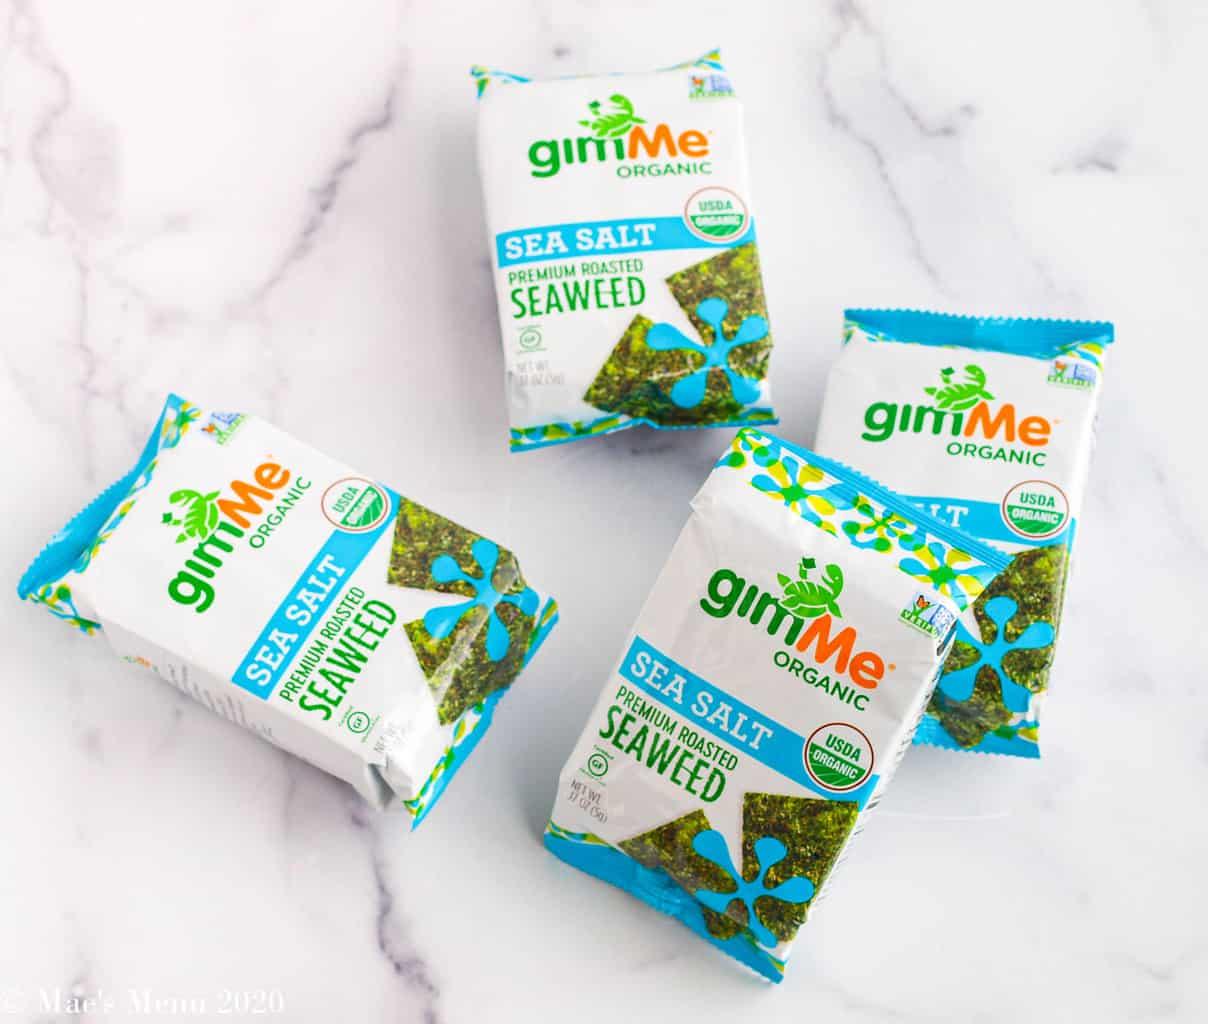 4 small packs of gimMe organic seaweed snacks